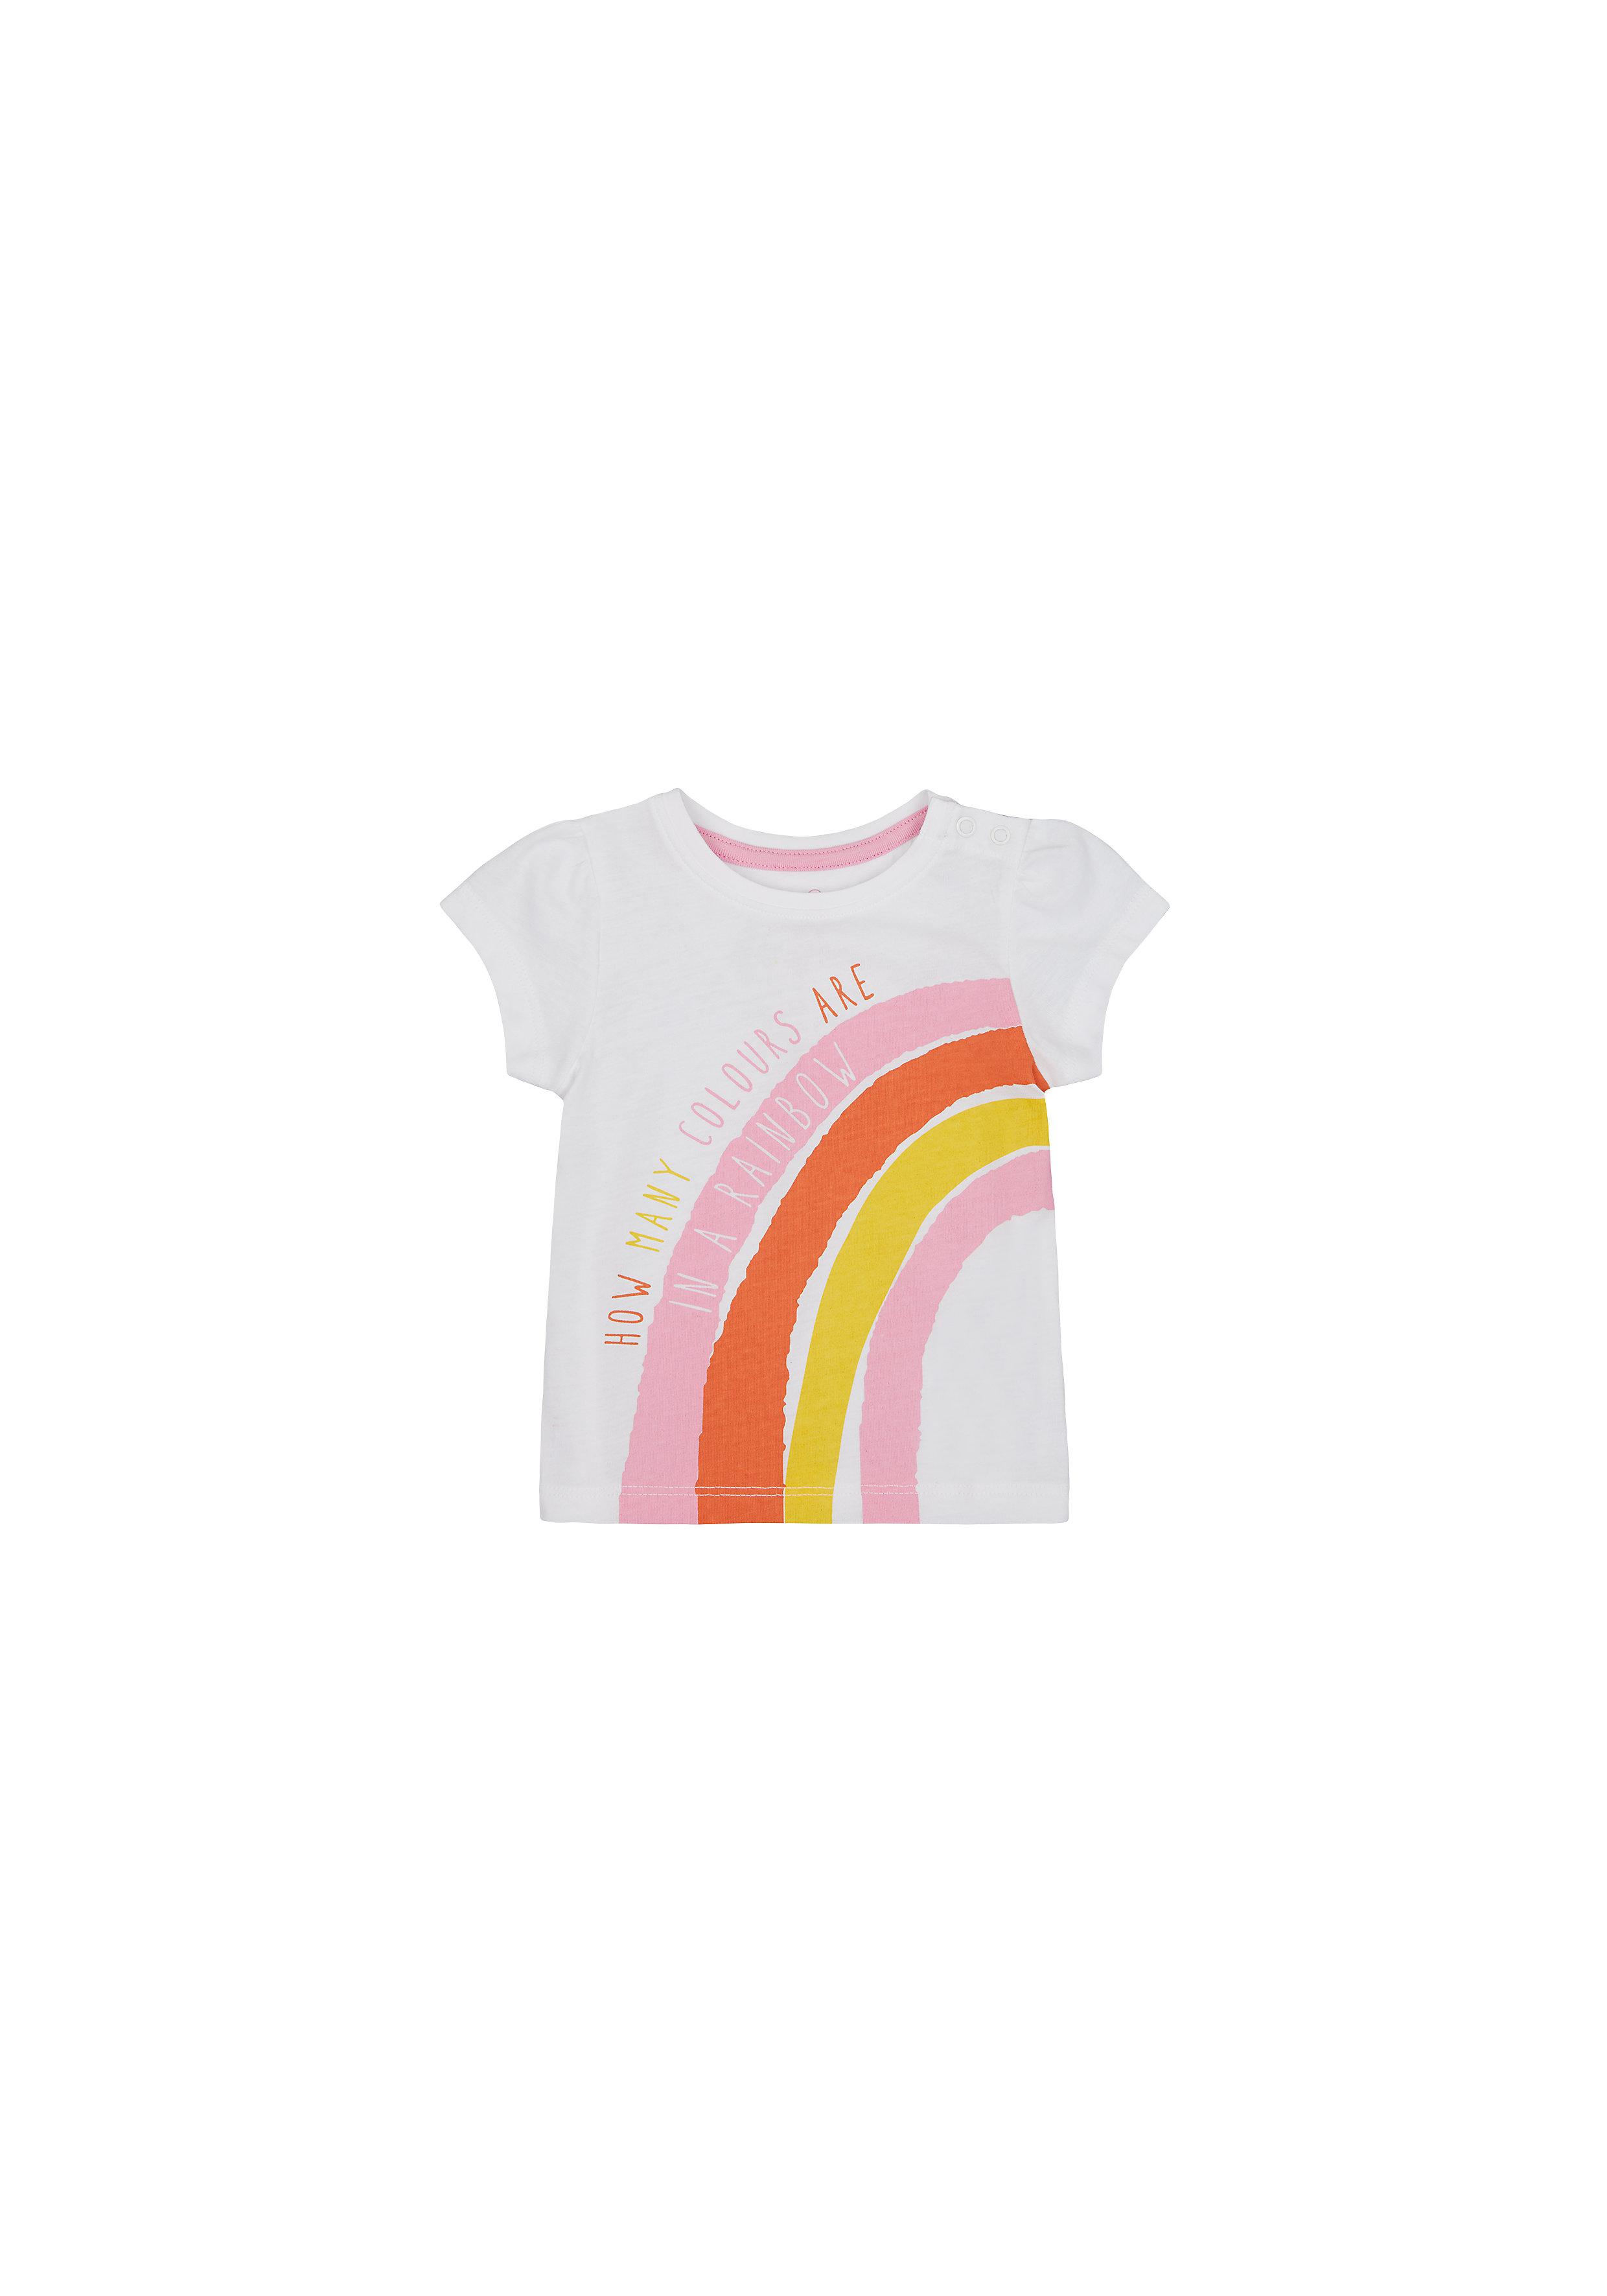 Mothercare | Girls Half Sleeves T-Shirt Rainbow Print - White